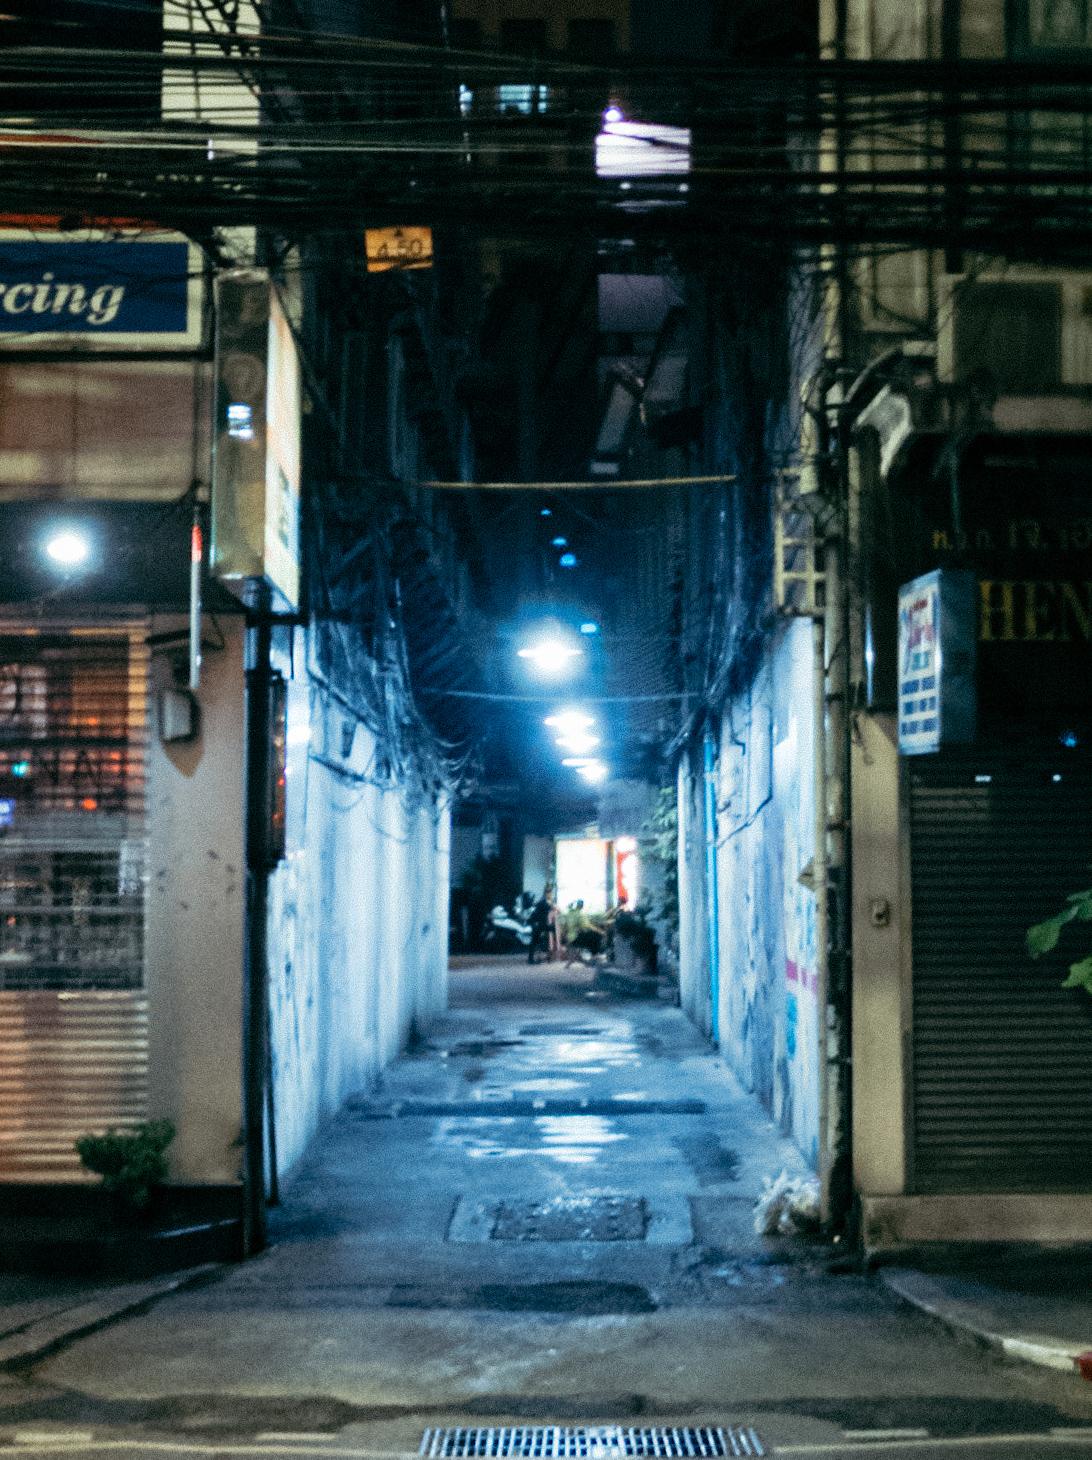 Bangkok Streets and Alleyways